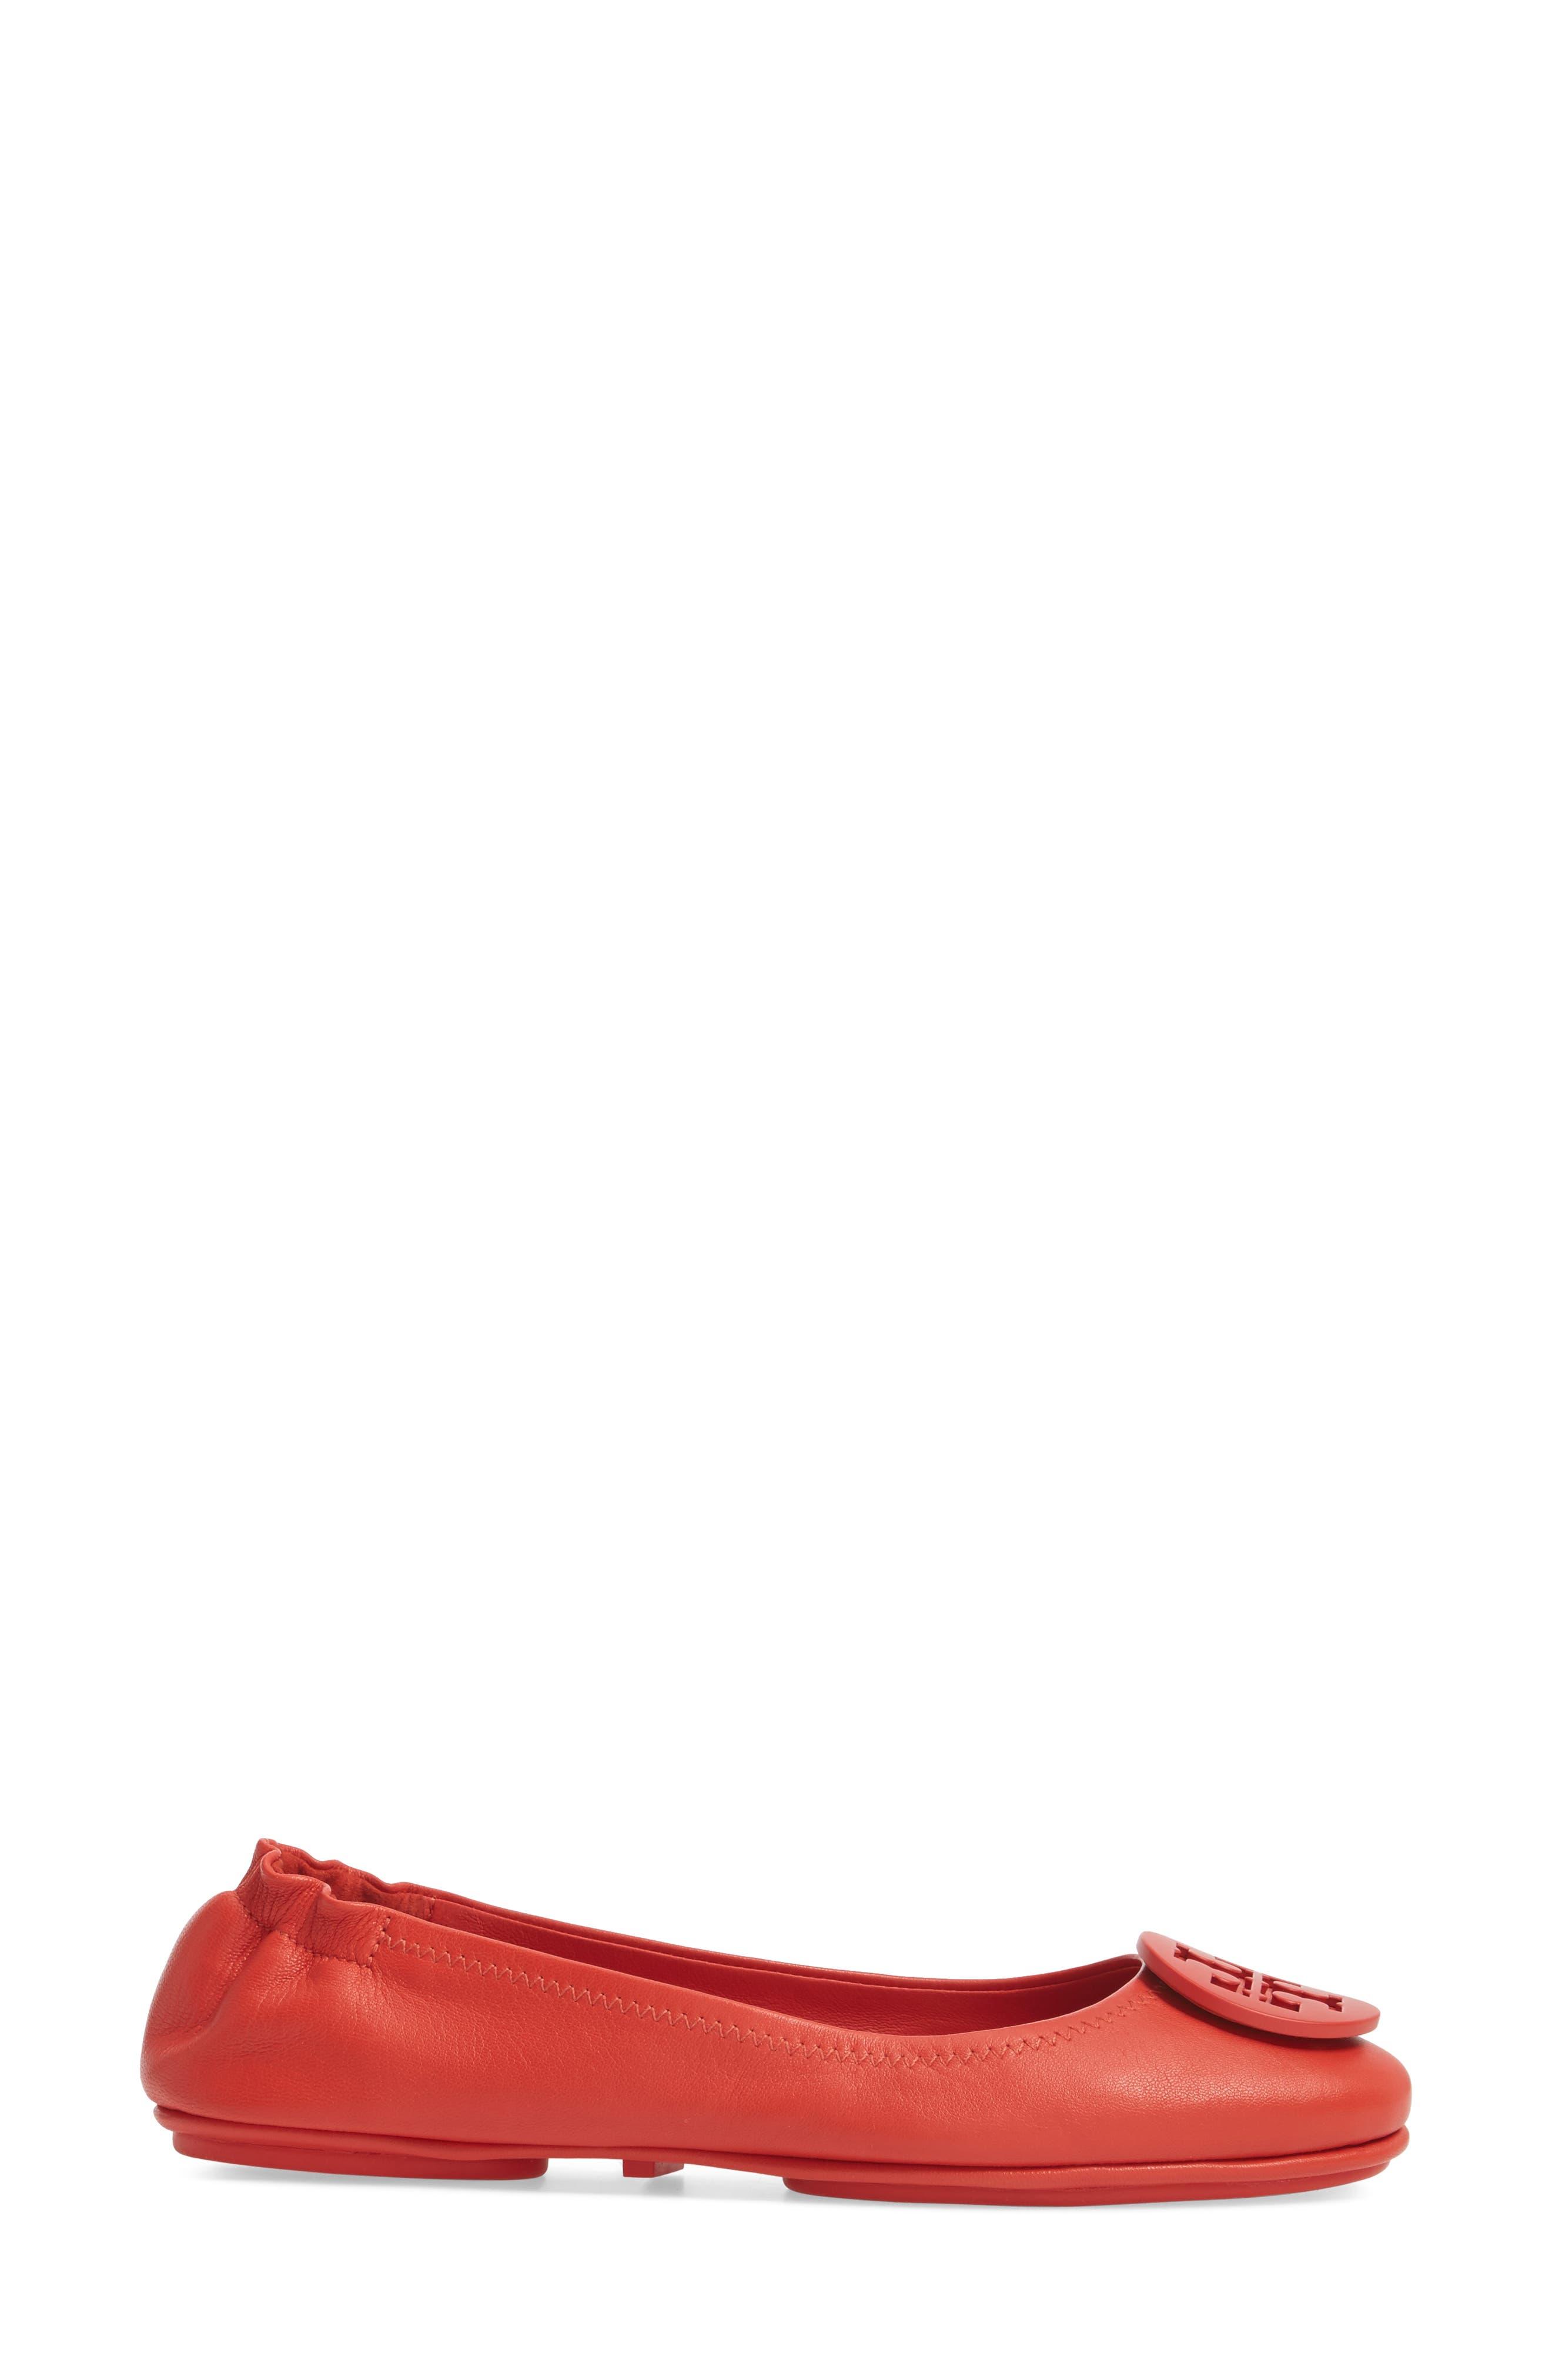 'Minnie' Travel Ballet Flat,                             Alternate thumbnail 169, color,